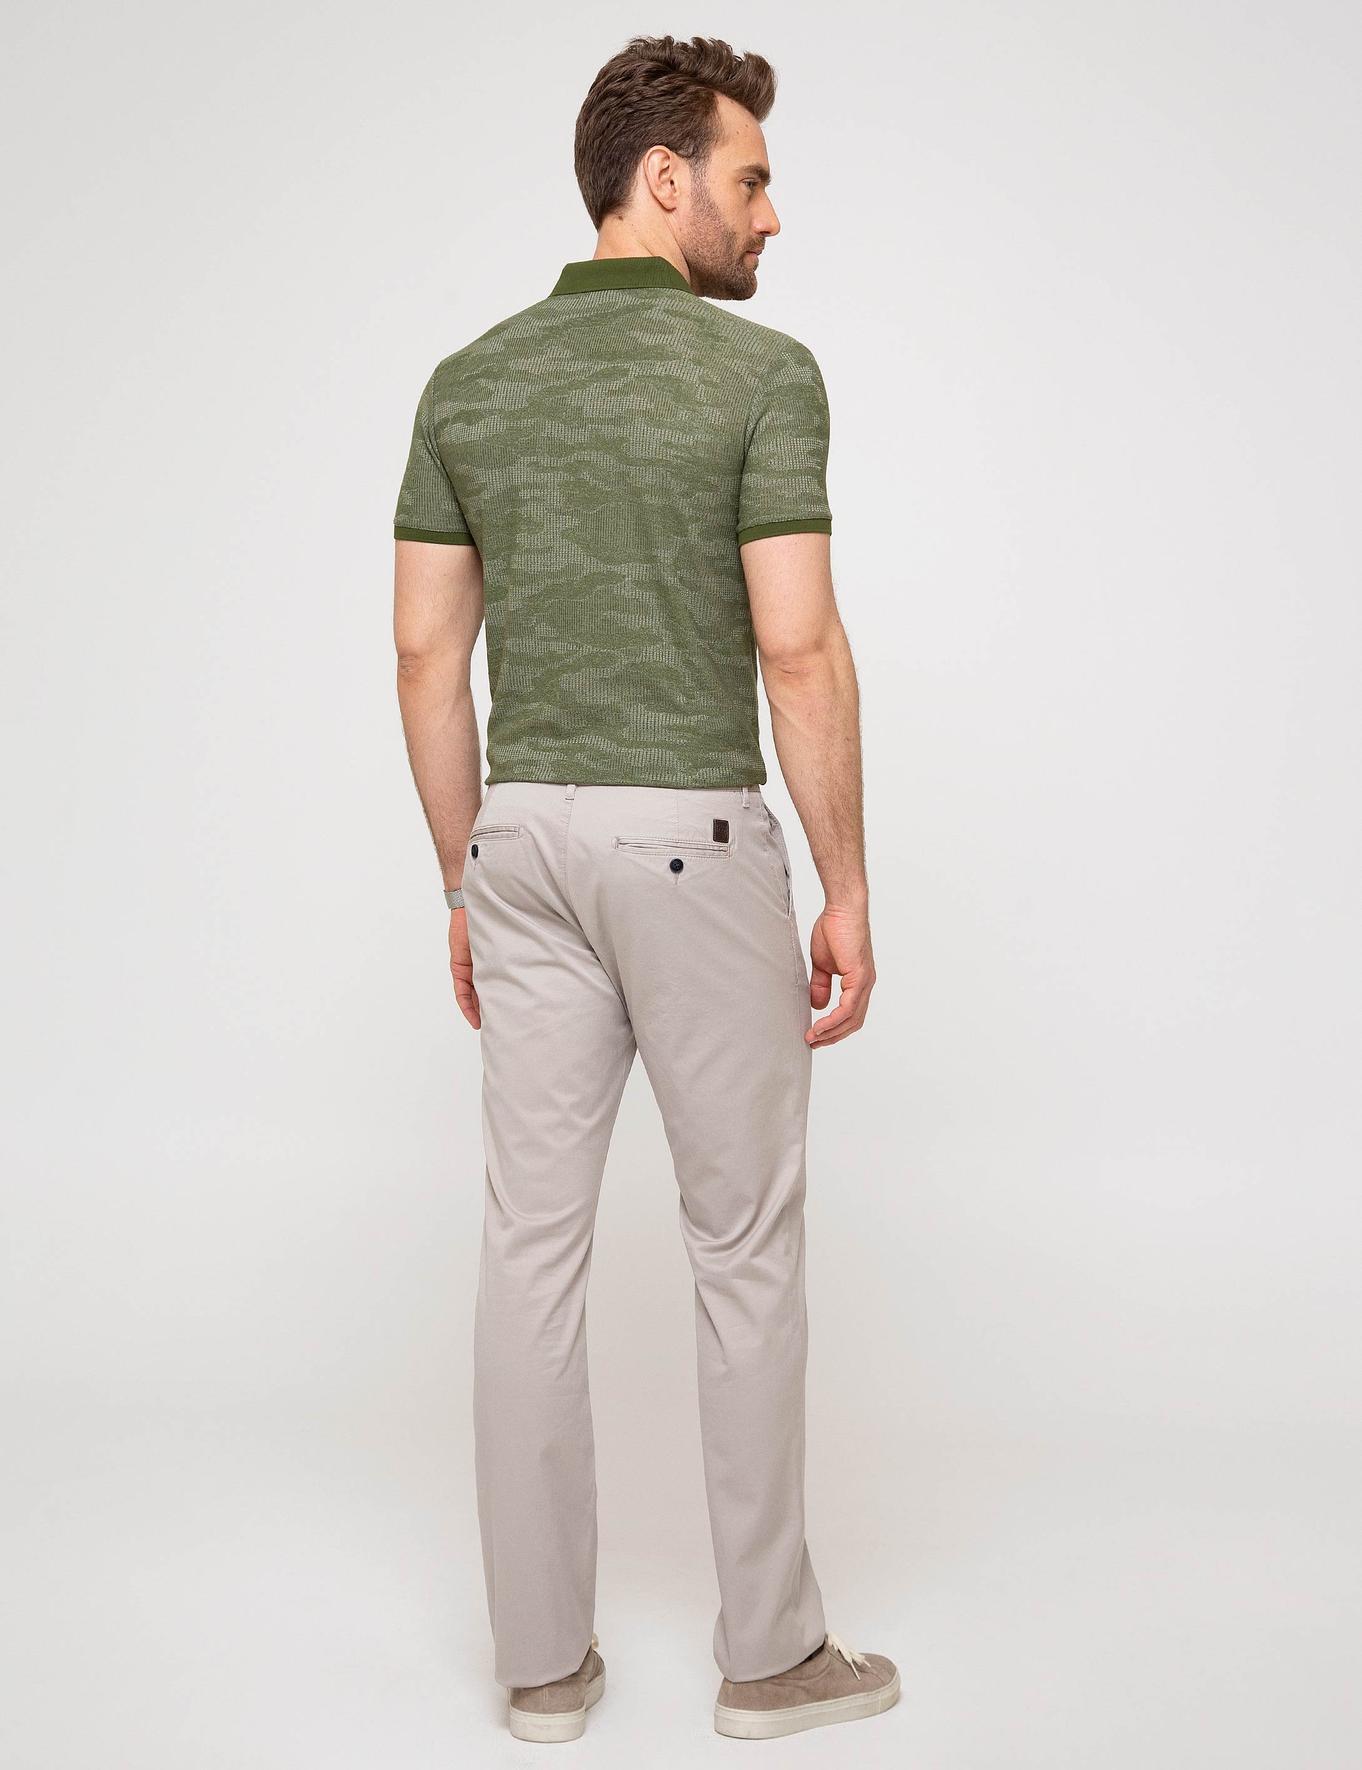 Taş Regular Fit Chino Pantolon